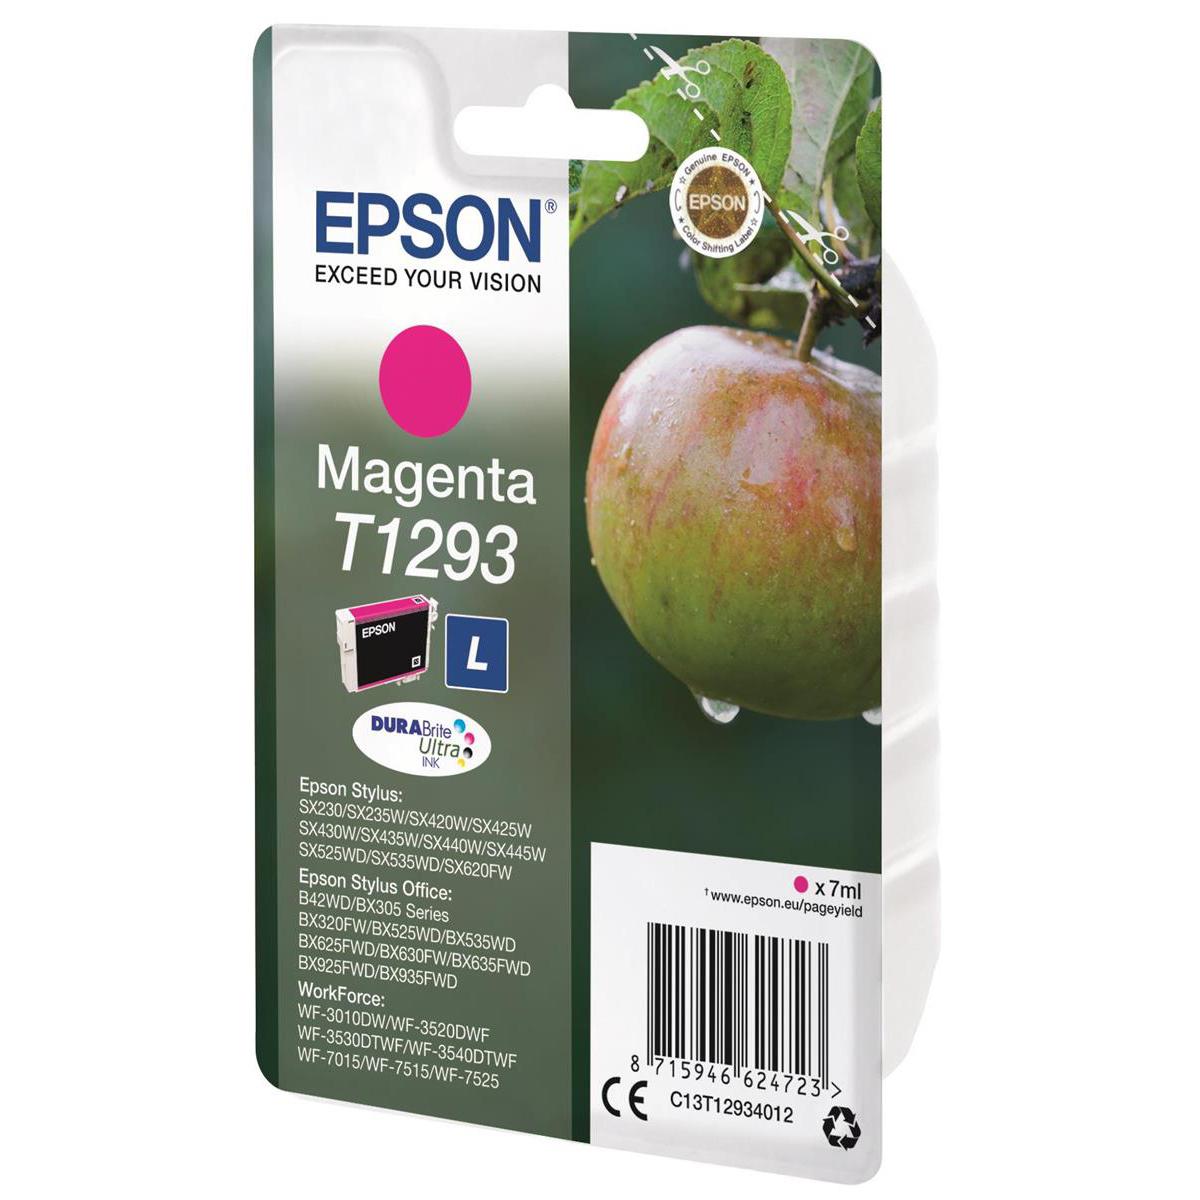 Epson T1293 Inkjet Cartridge Apple L Page Life 330pp 7ml Magenta Ref C13T12934012